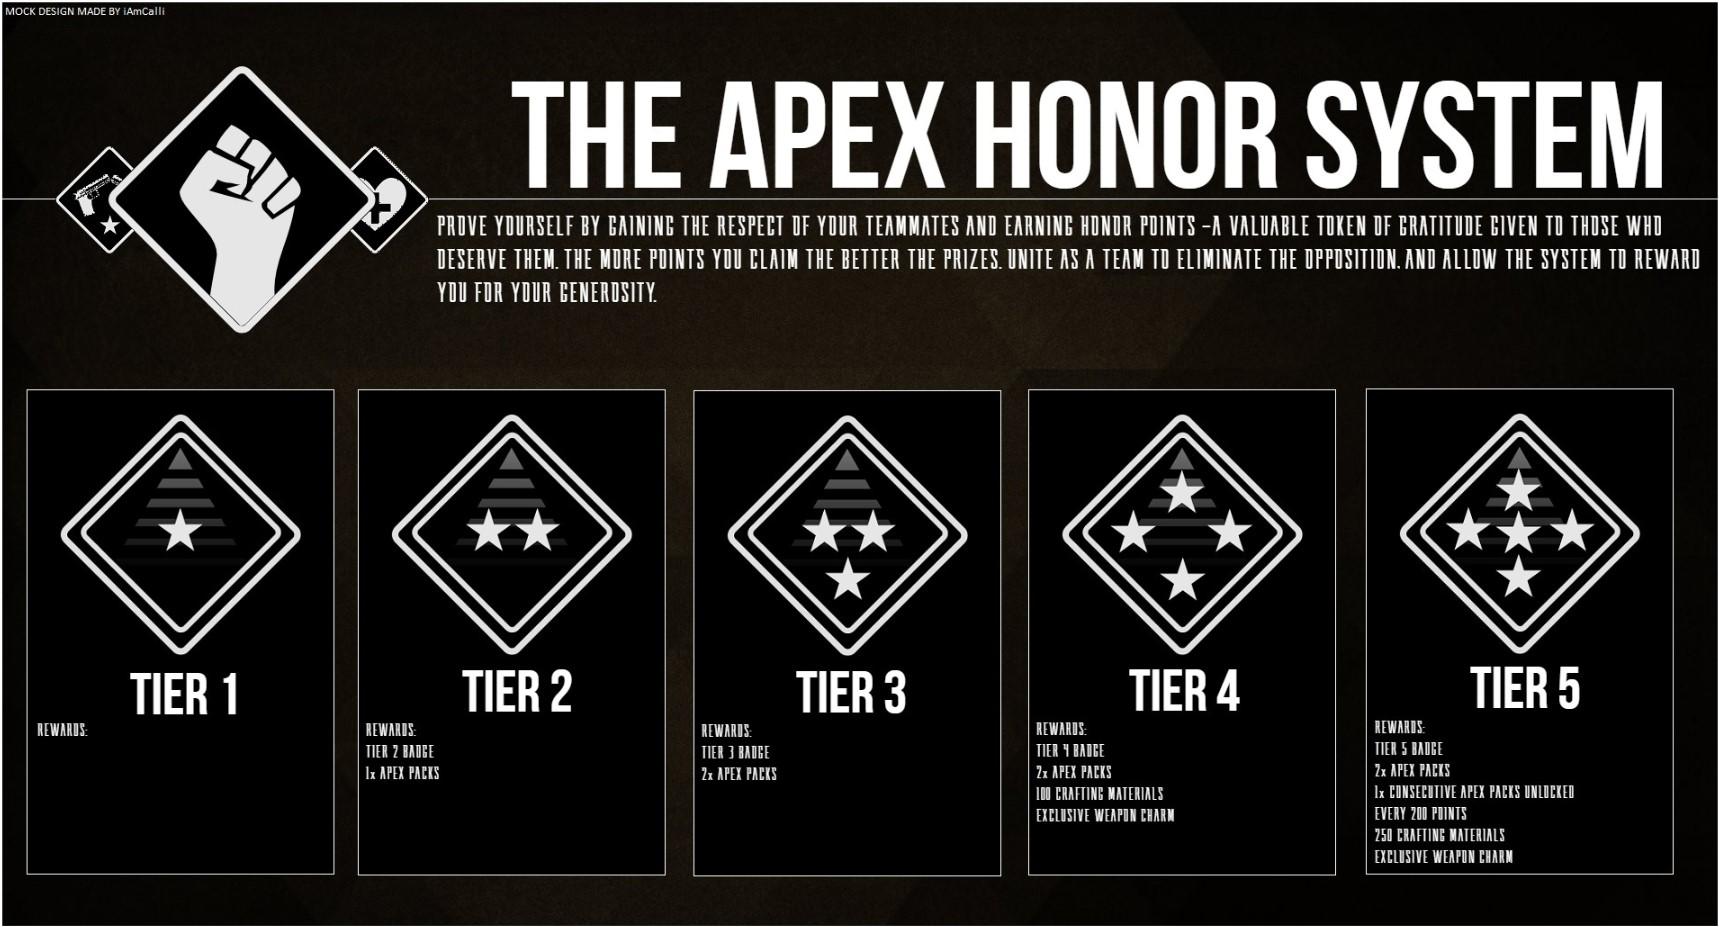 Apex Legends Honor System concept.